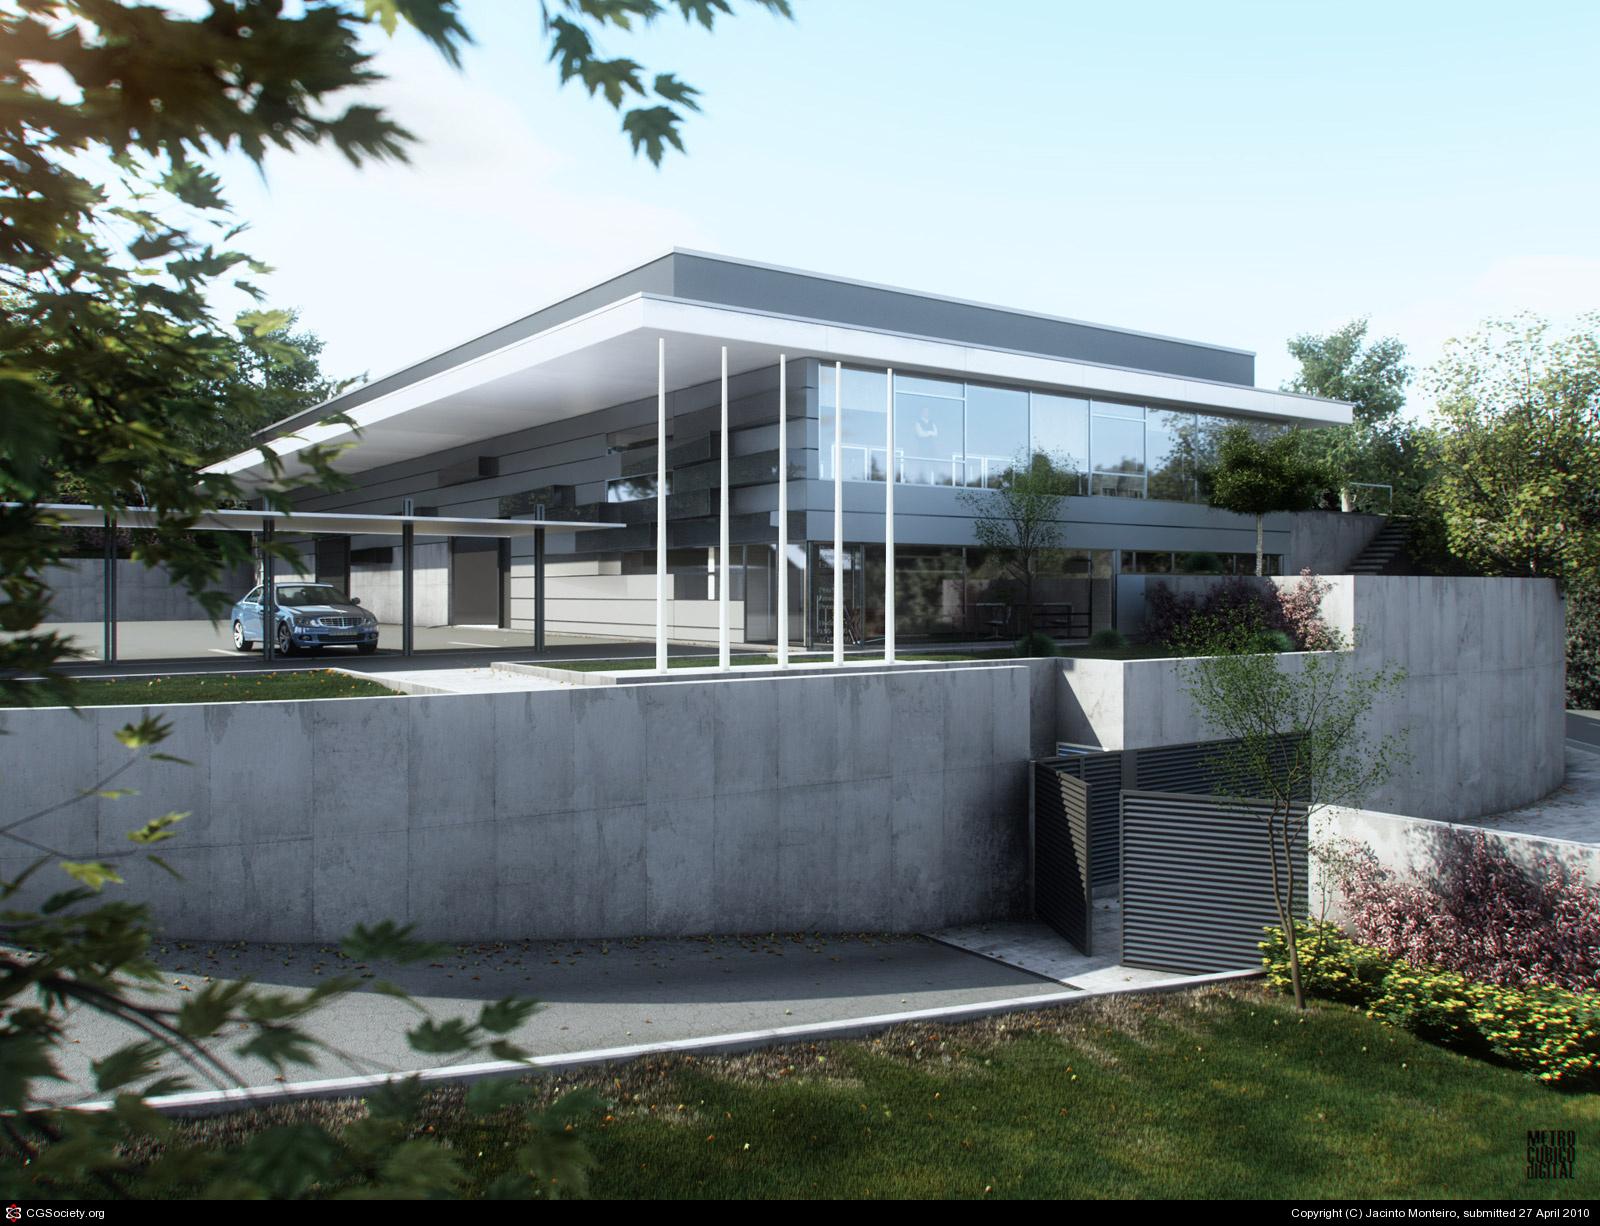 Modern Architecture Render 50 amazing architectural renders